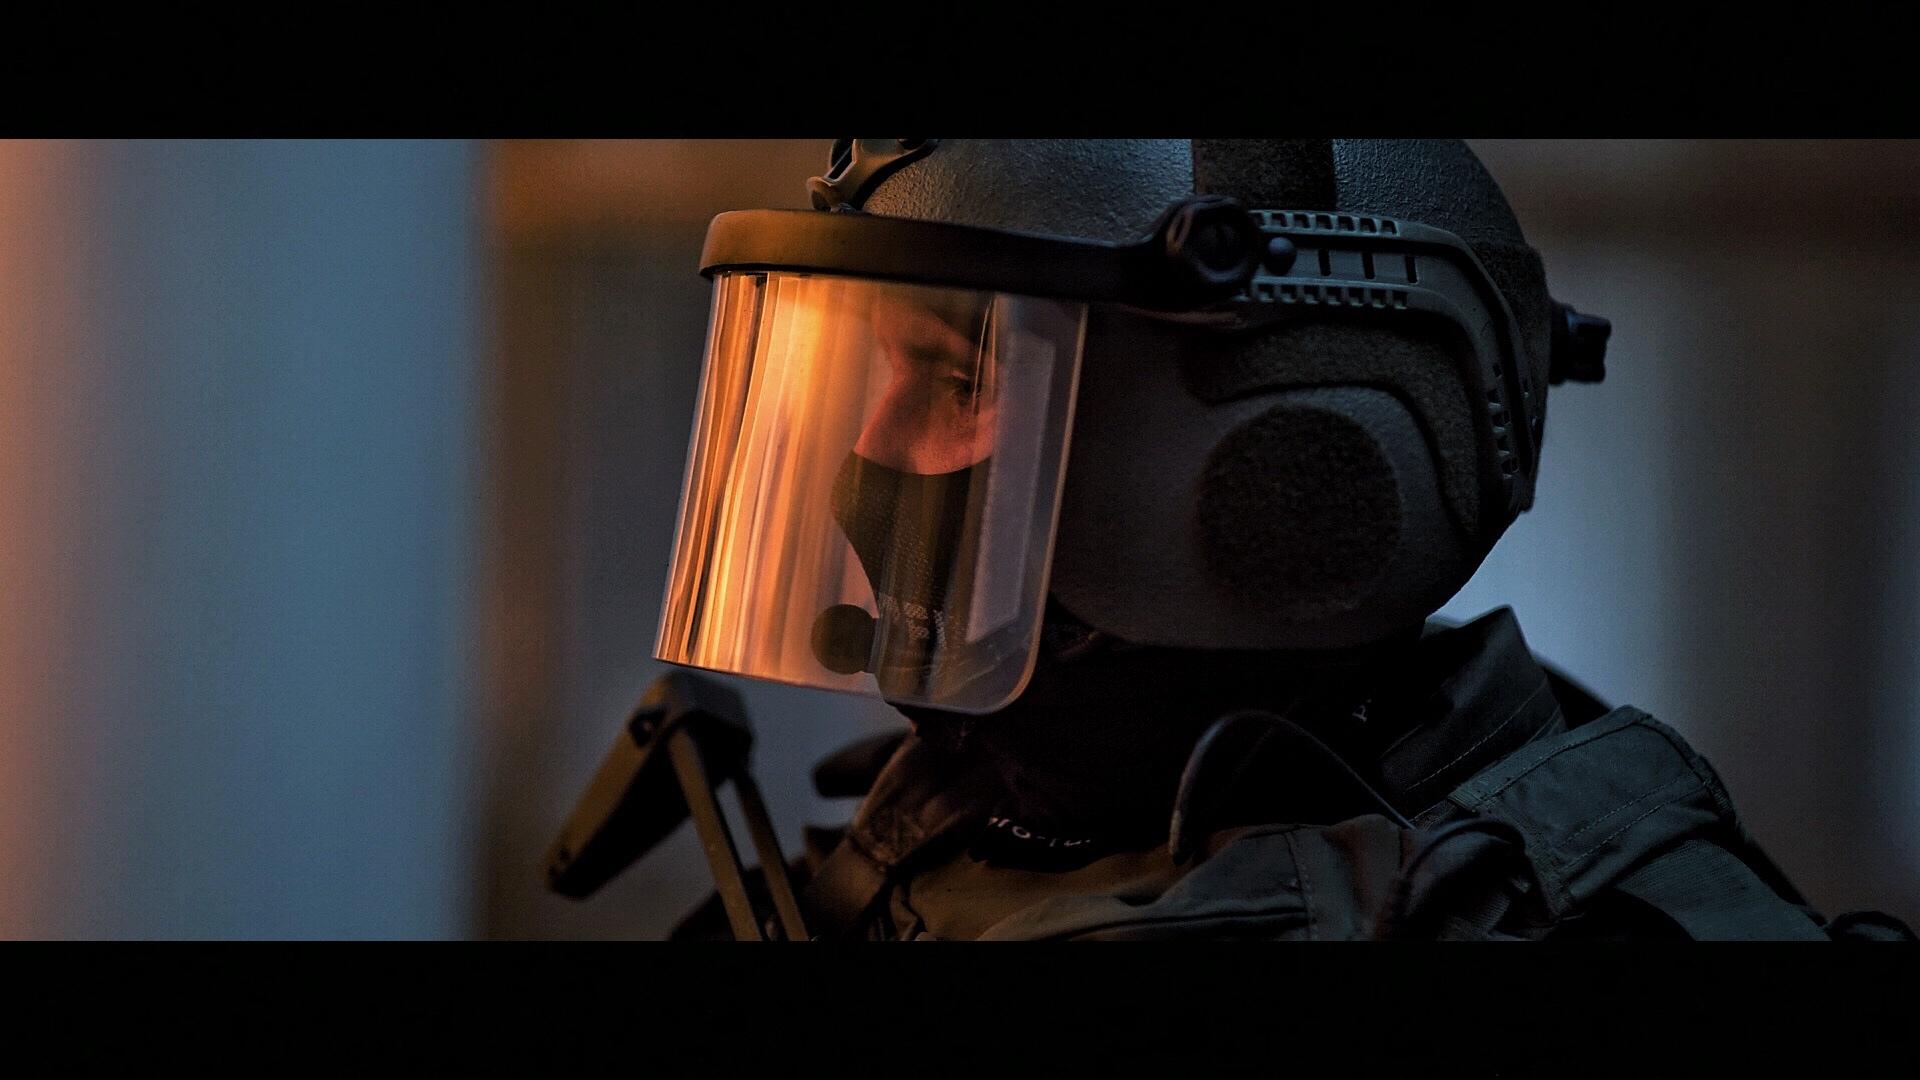 MG Action, MG Forces, Special Forces für Film, SEK Film, GSG9 Film, Polizei Film